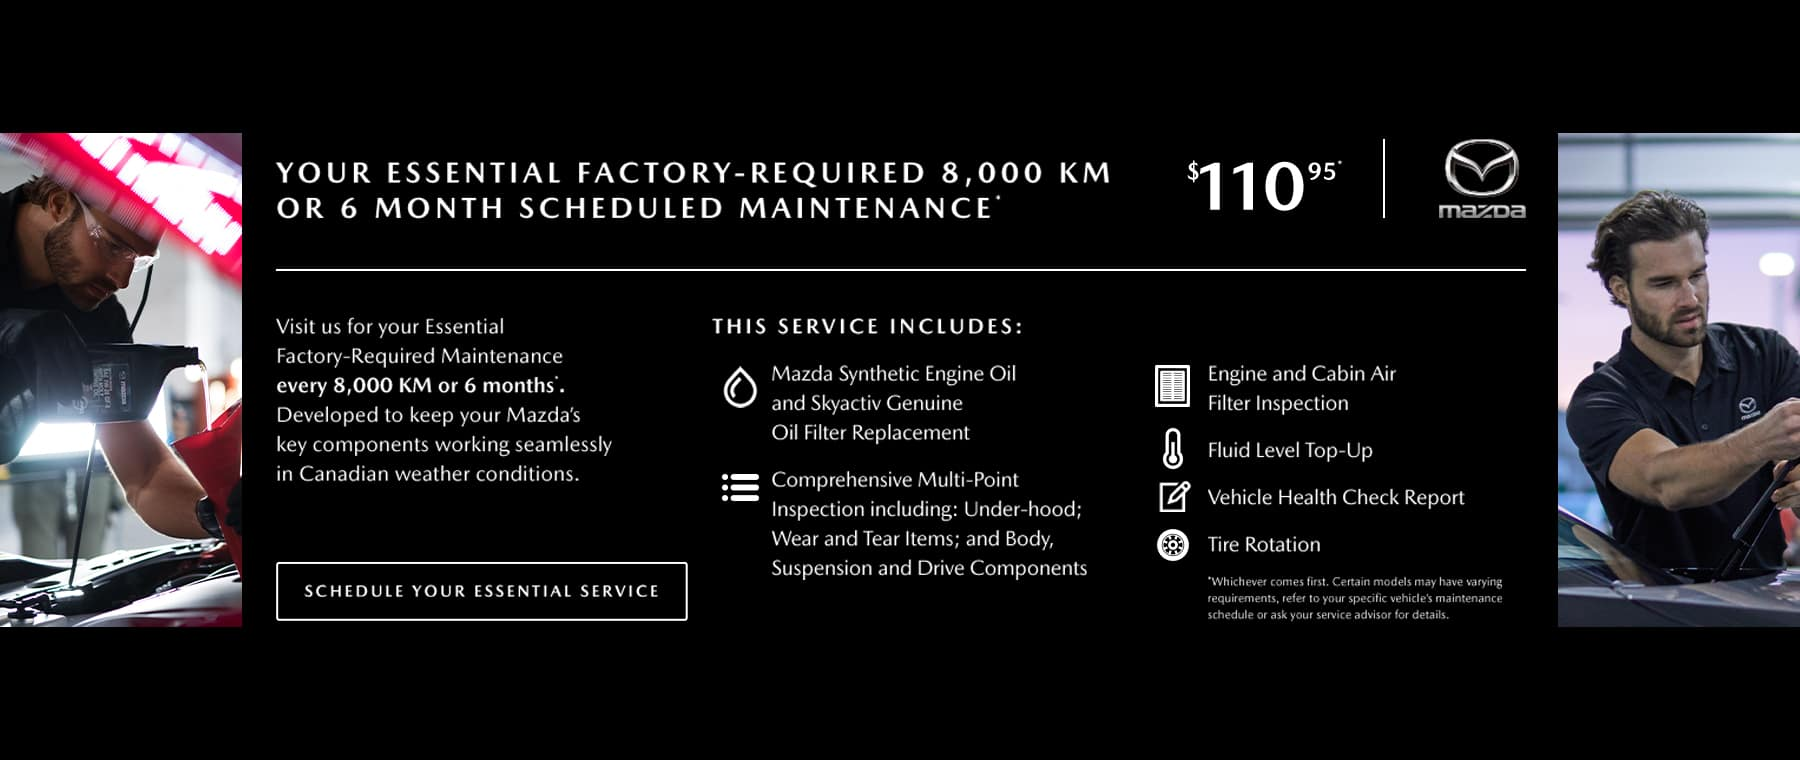 110 – Desktop – 1800 X 760